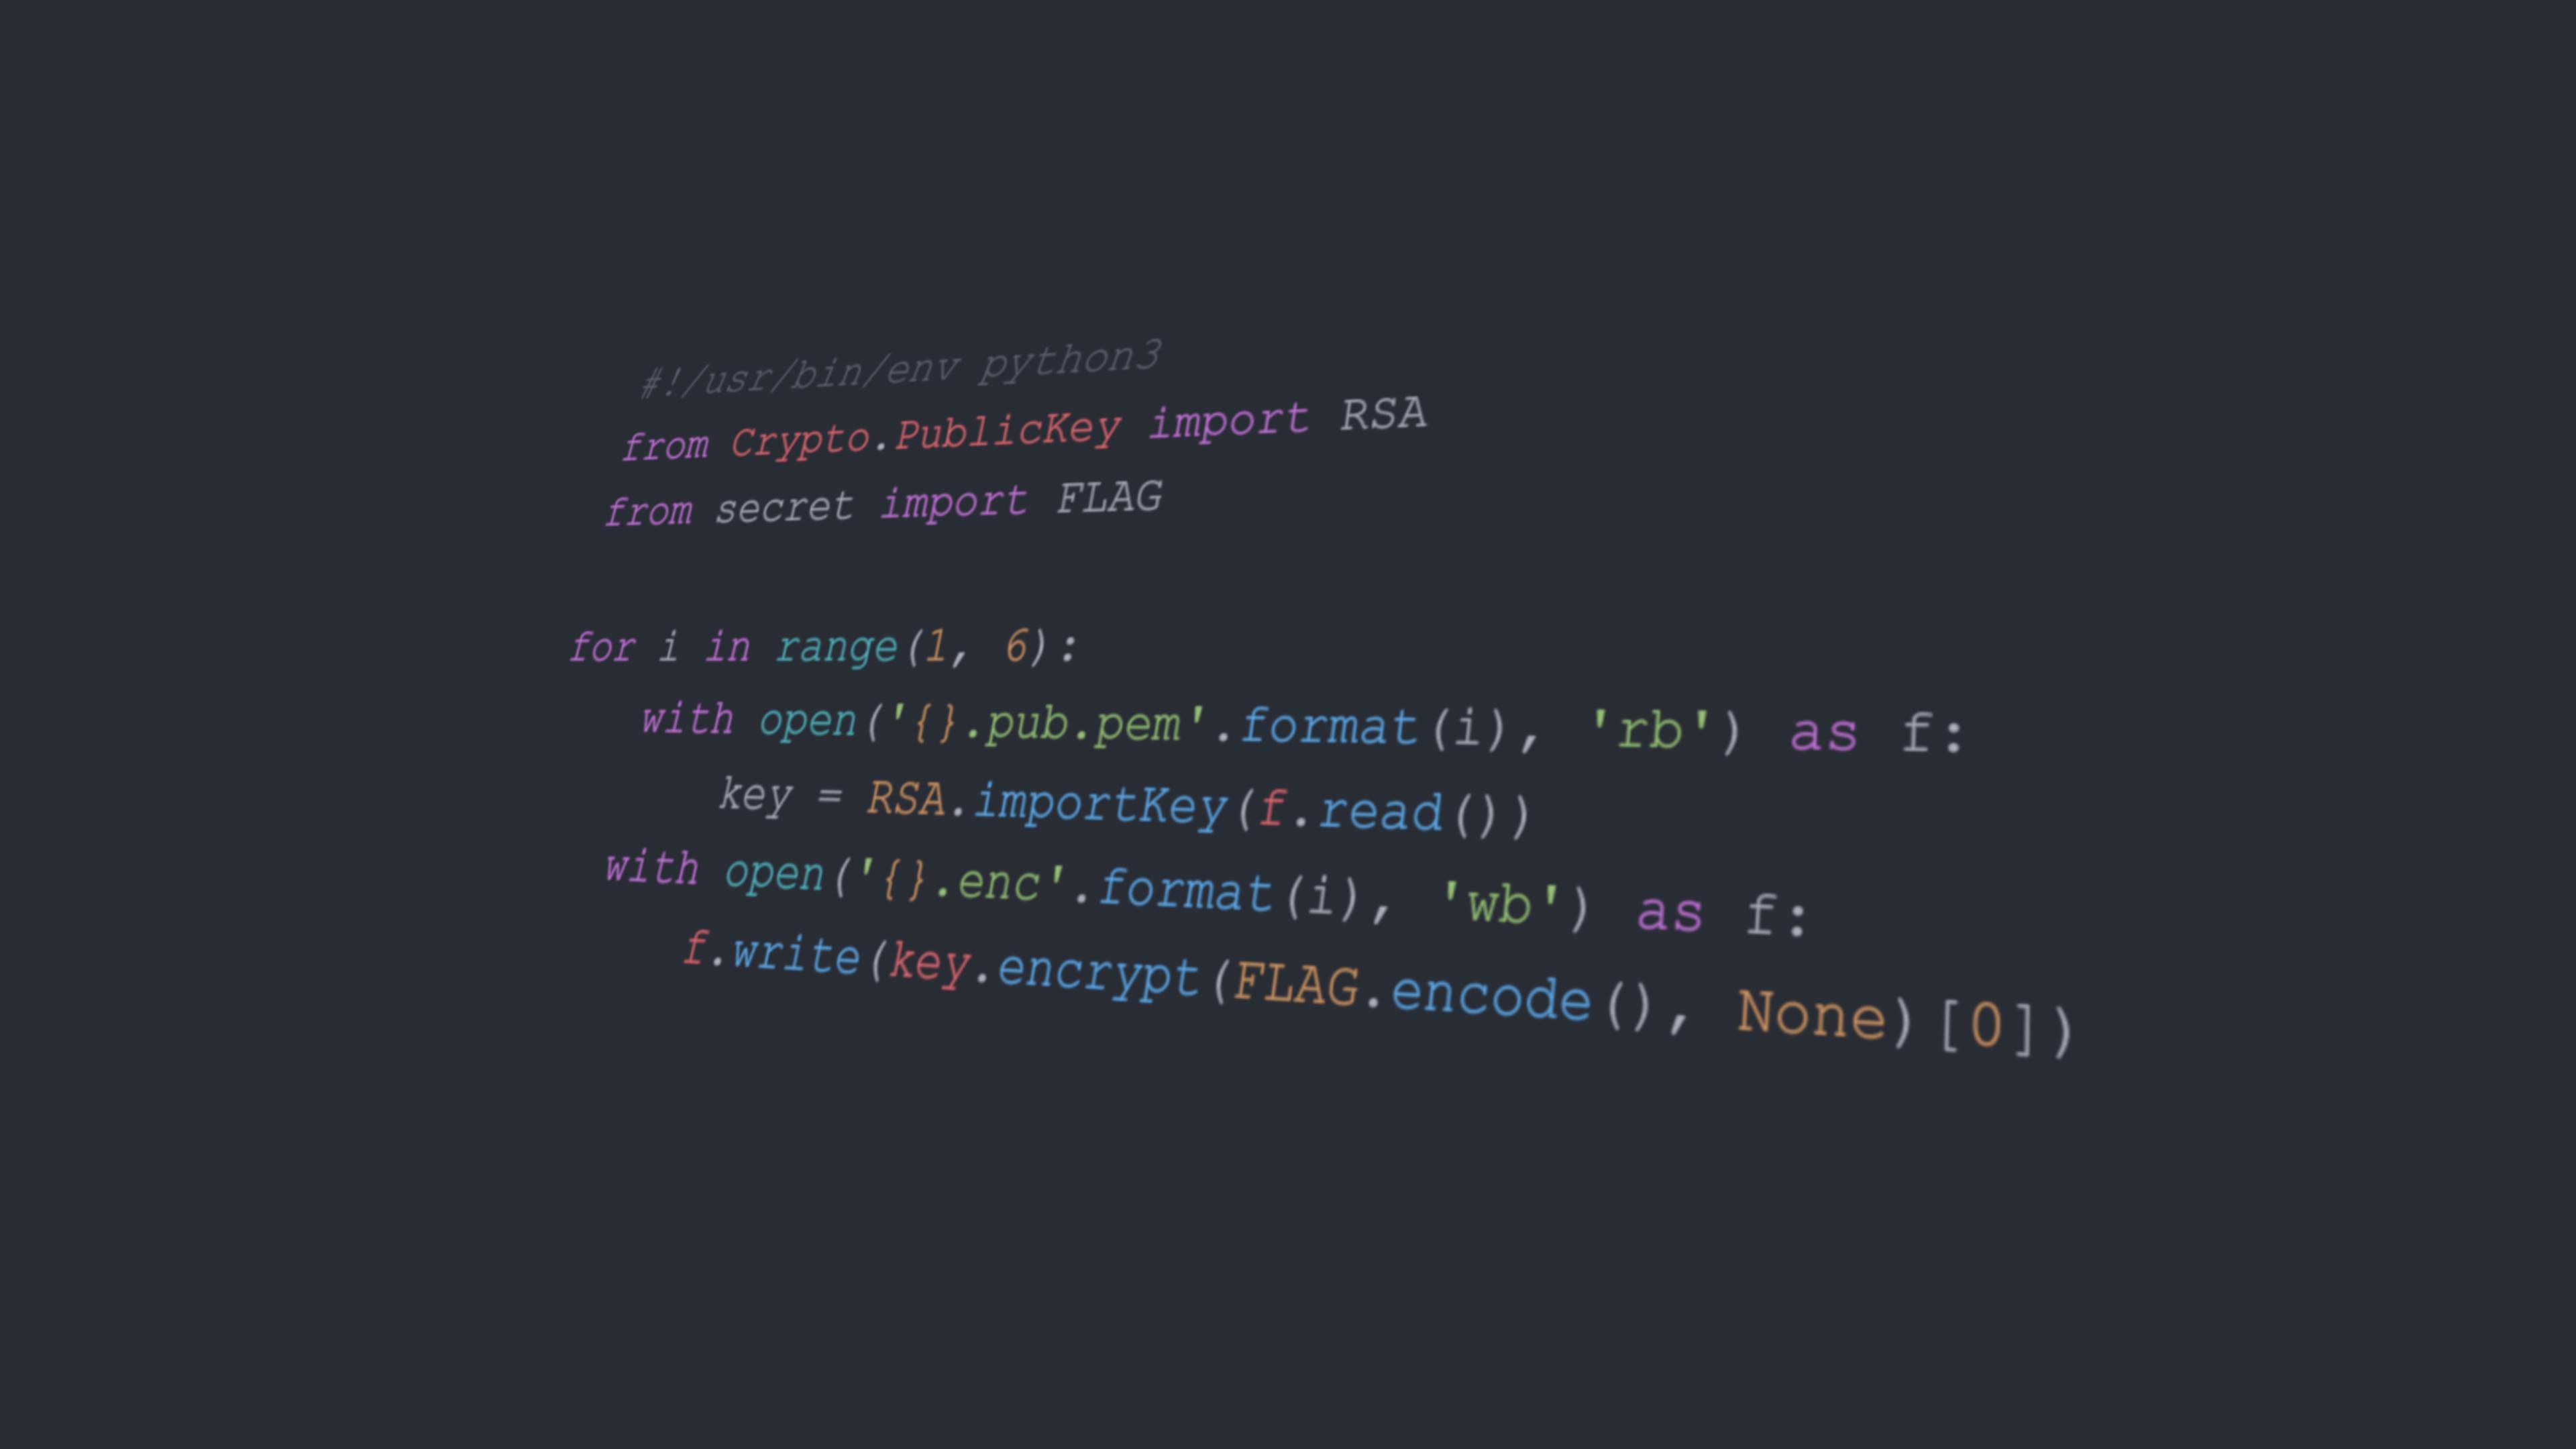 Python Programming Syntax 4k, HD Computer, 4k Wallpapers